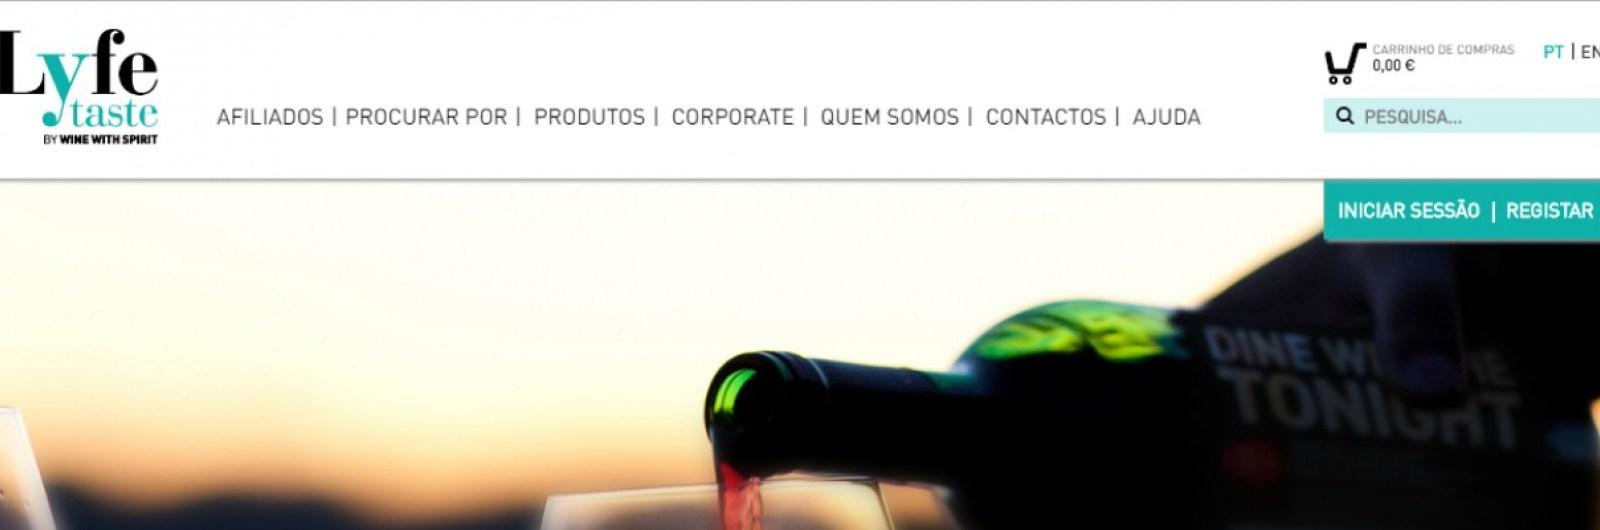 Wine With Spirit